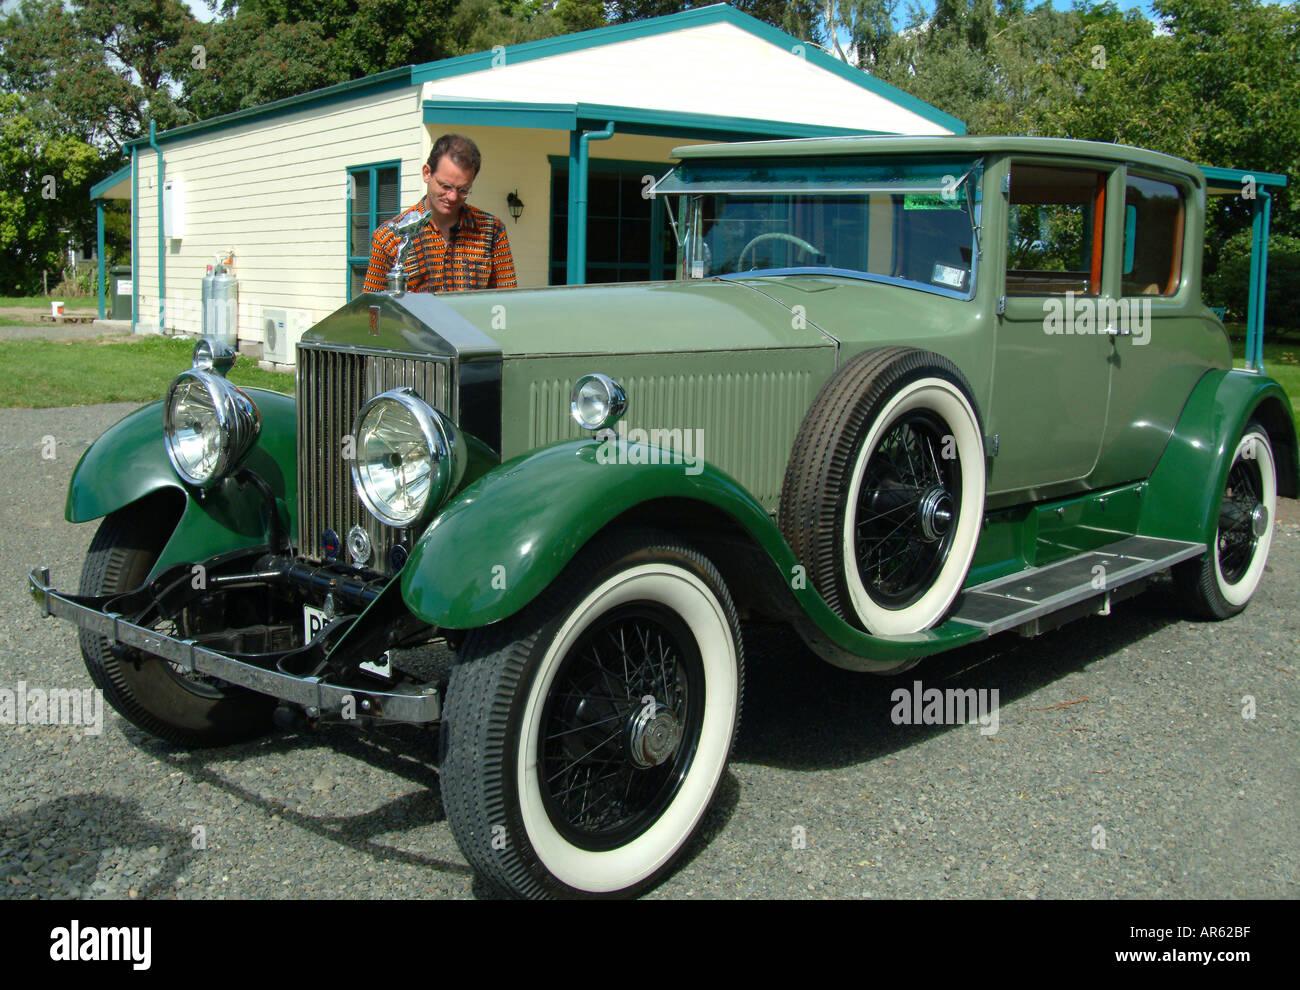 Vintage car classic cars Hawkes bay rally New Zealand Stock Photo ...